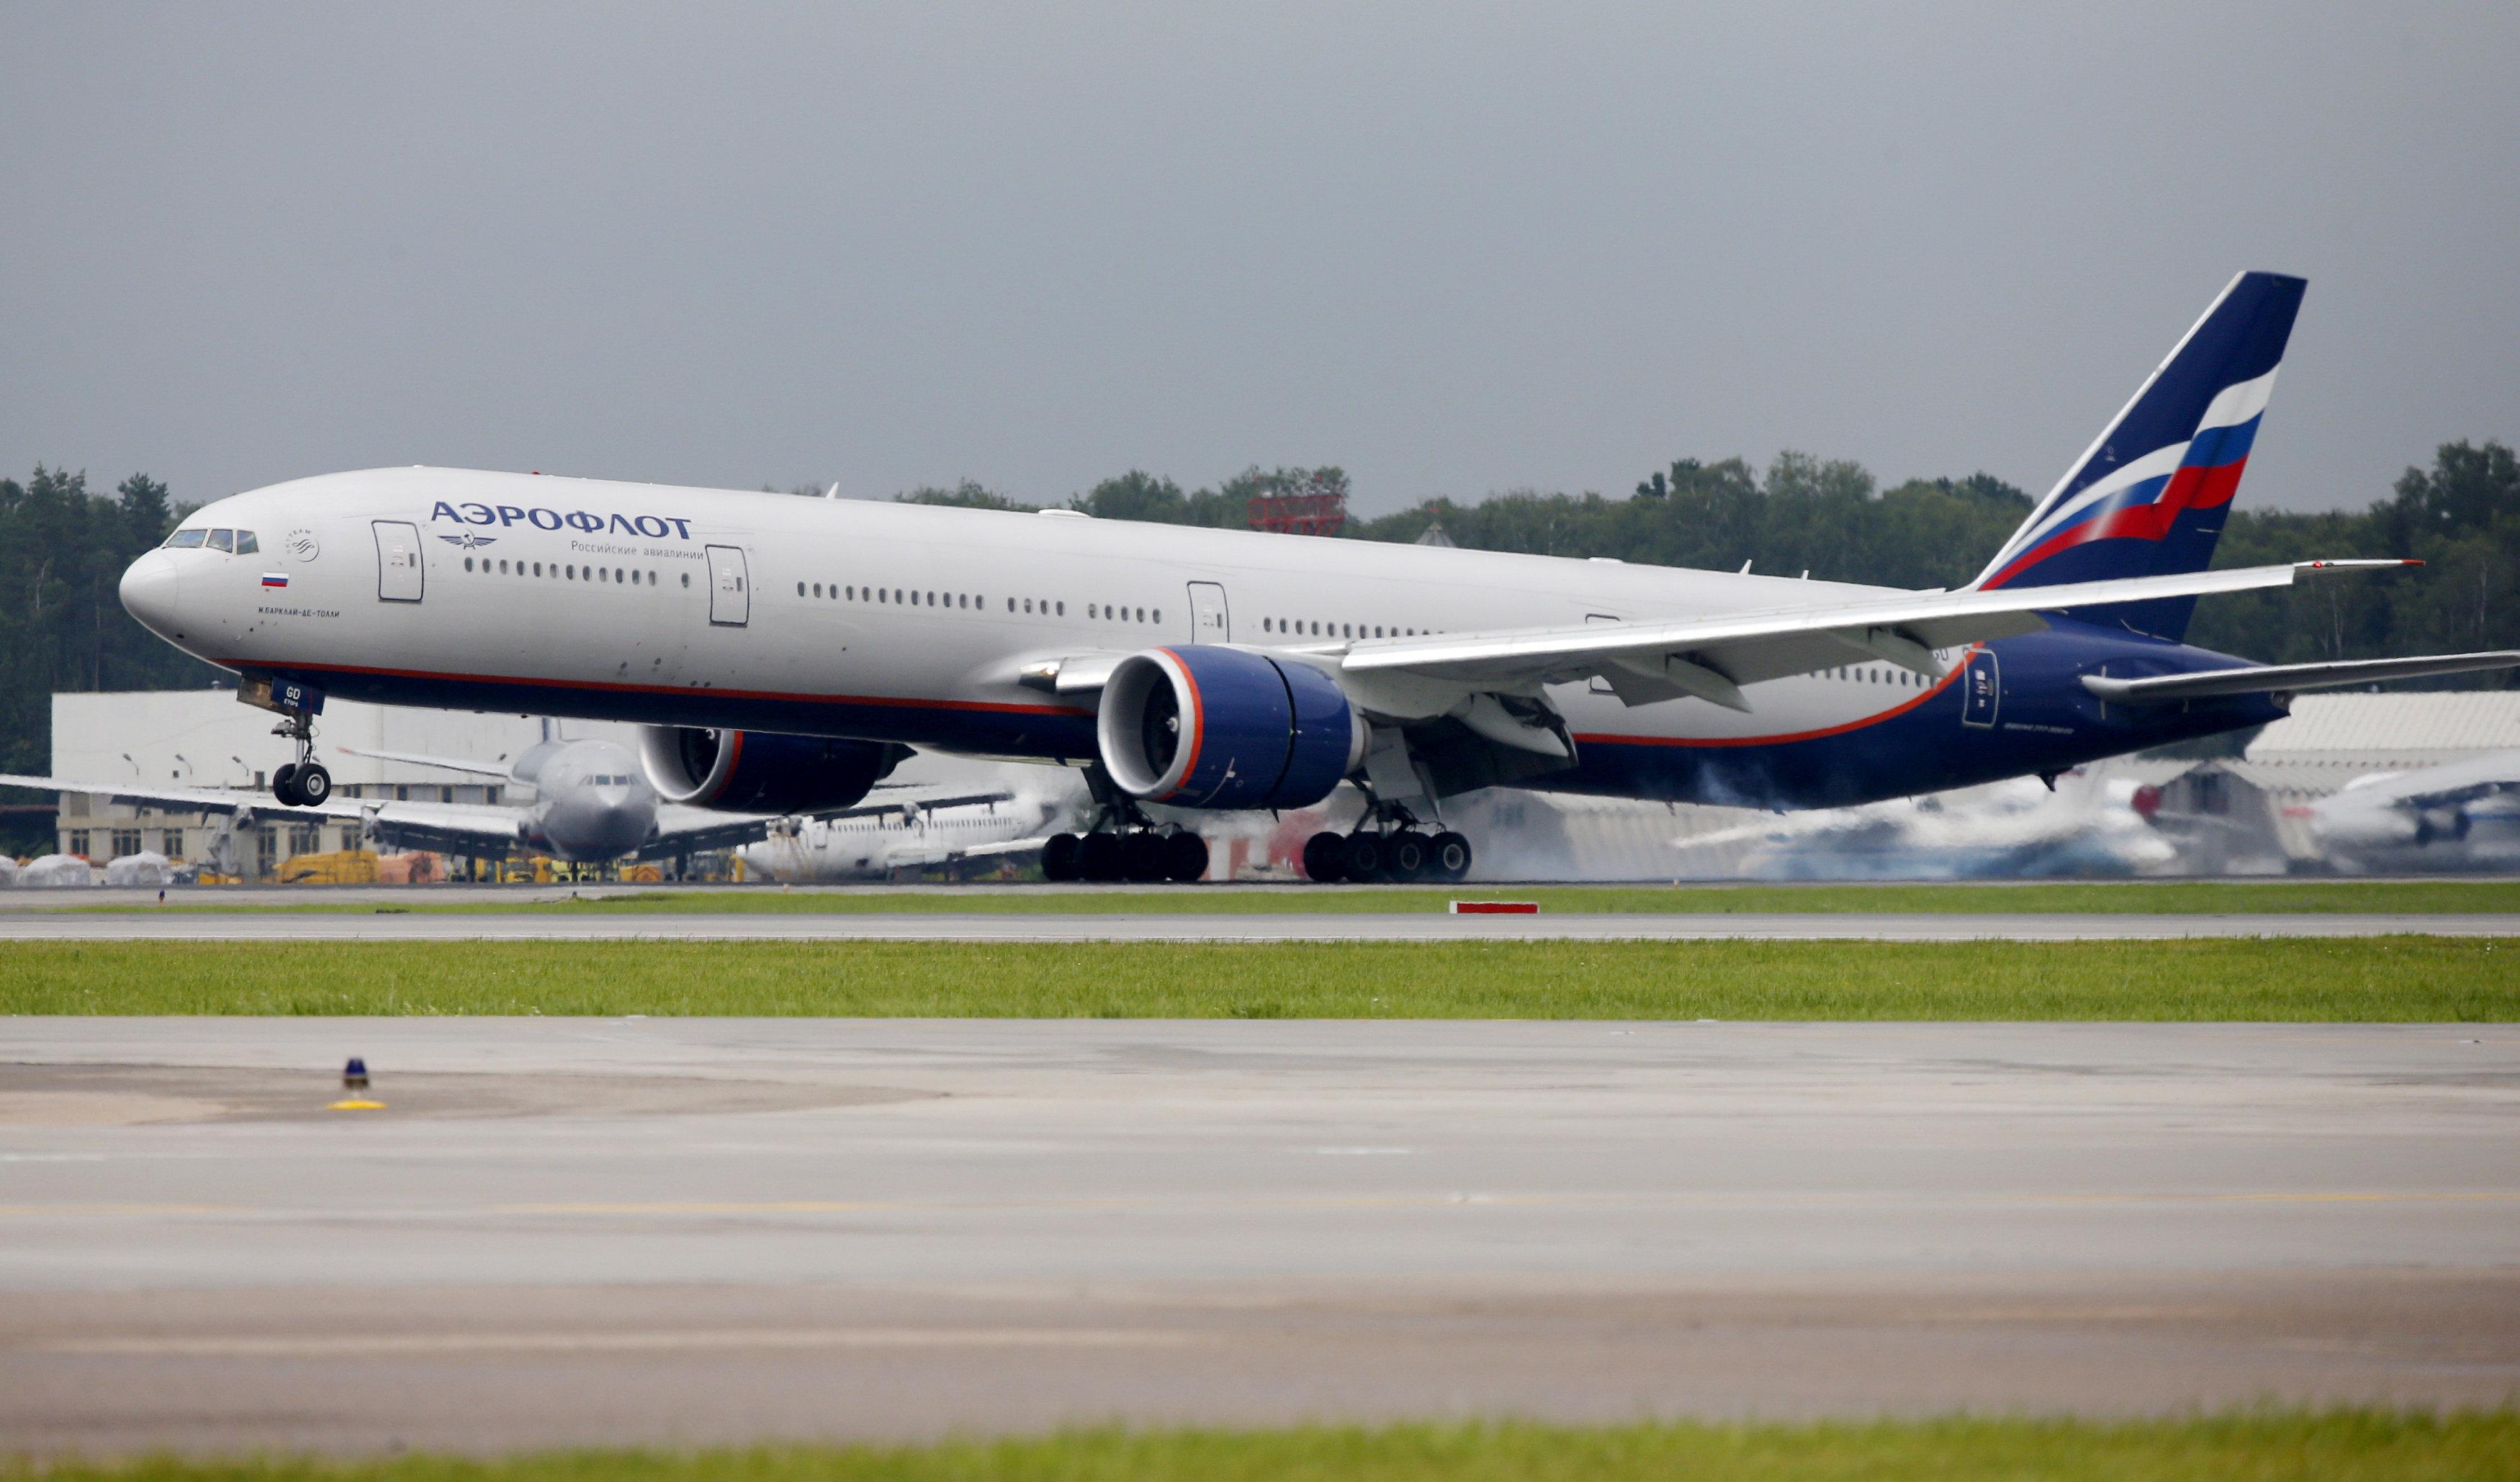 Boeing 777-300ER da Aeroflot pousa no Sheremetyevo, em Moscou (Foto: Maxim Shemetov/Reuters)